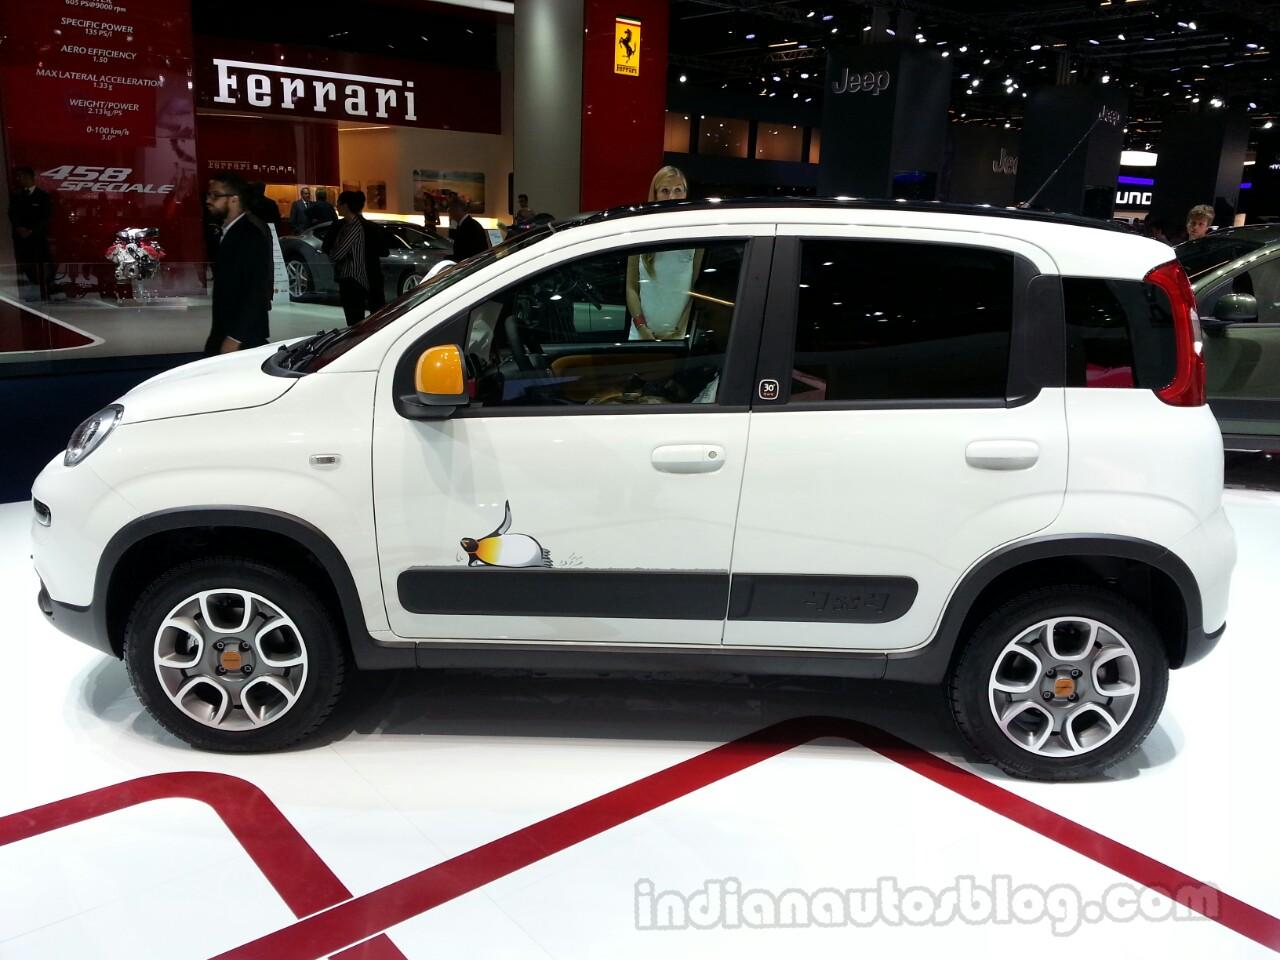 Fiat Panda Antartica side